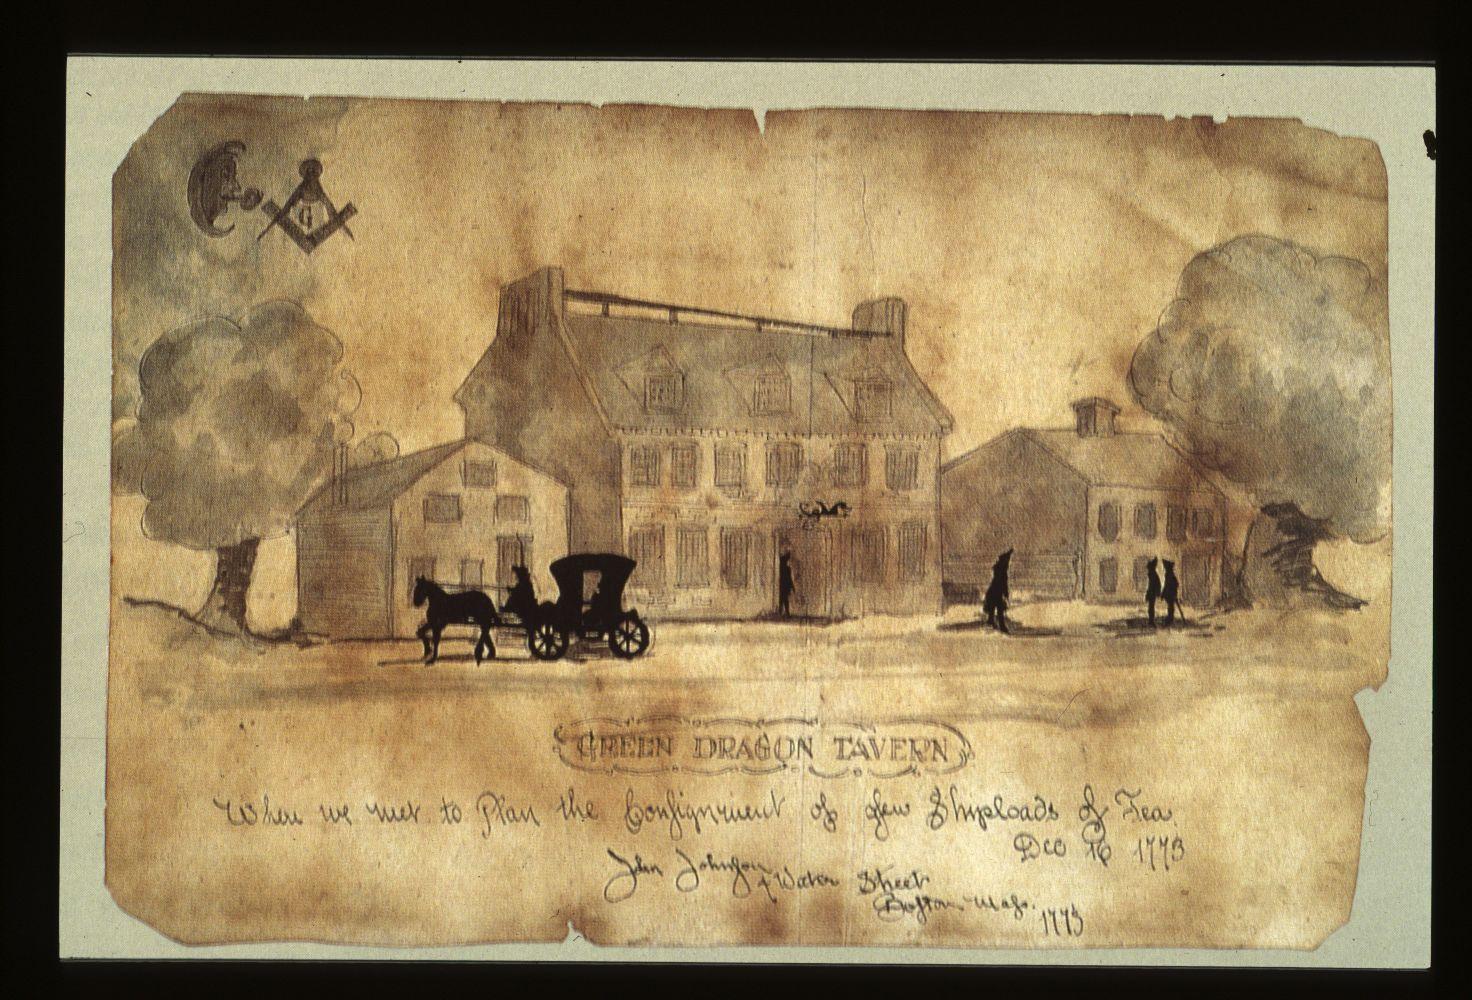 File:1773 GreenDragonTavern Boston.jpg